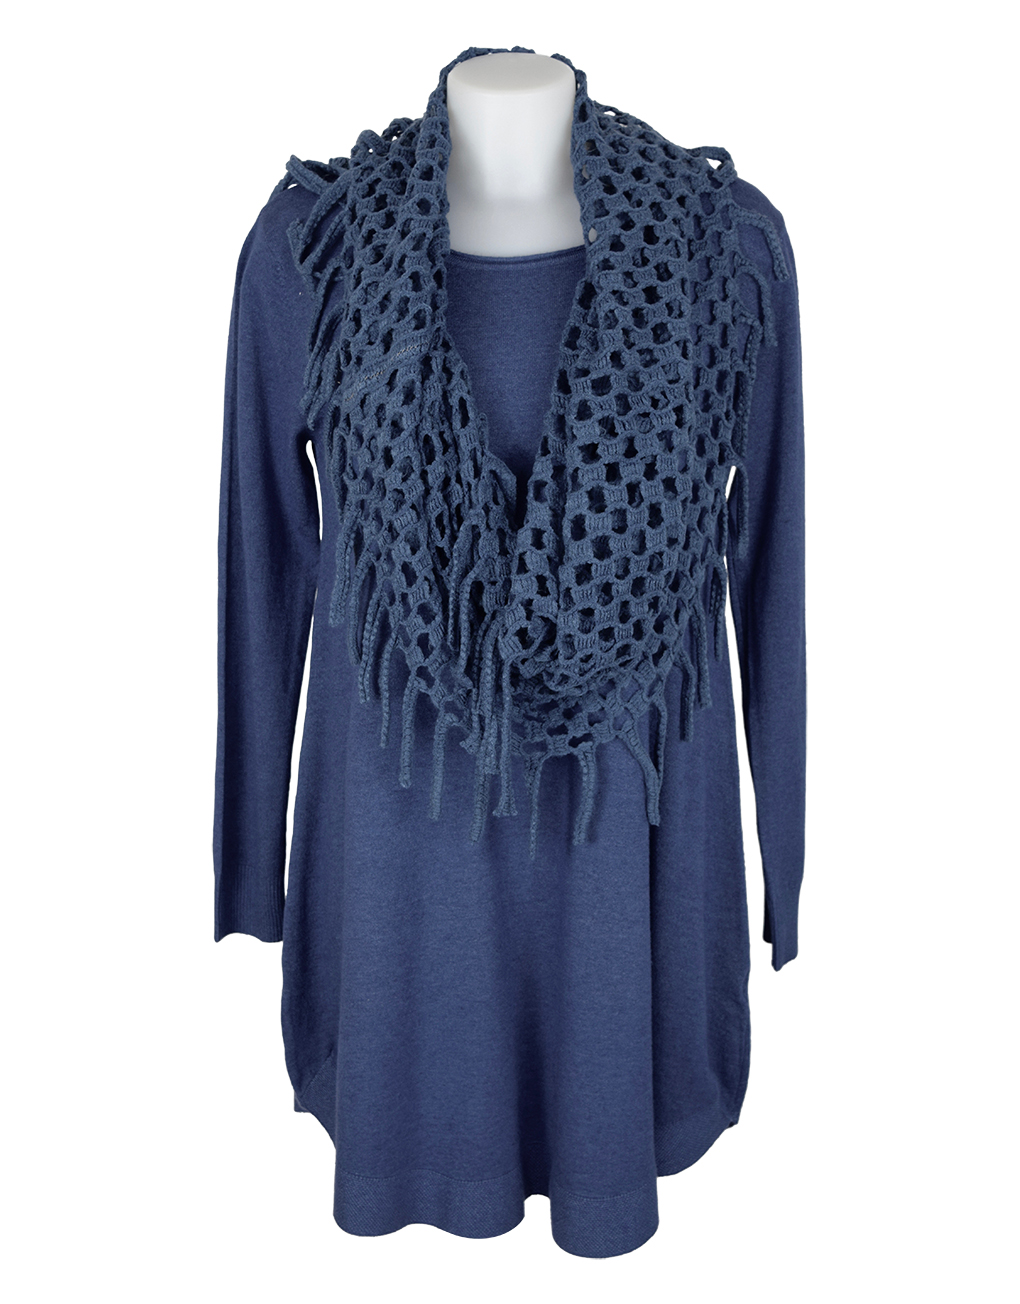 Italian-dress-blue-with-holey-scarf-snood